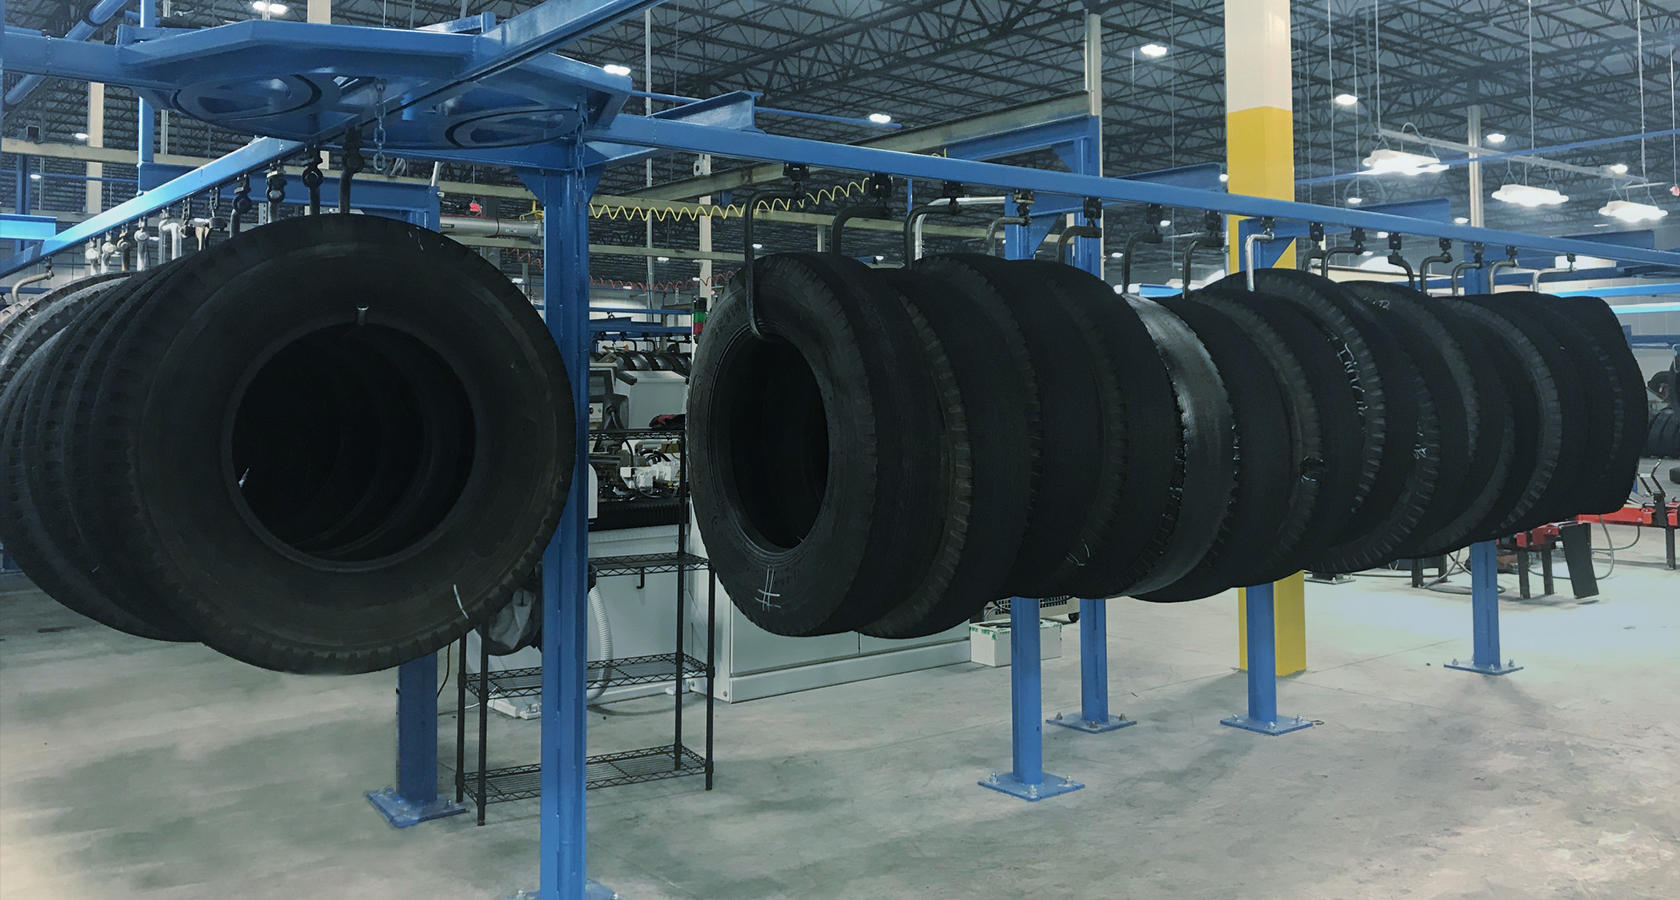 TRAC Tire Services image 1